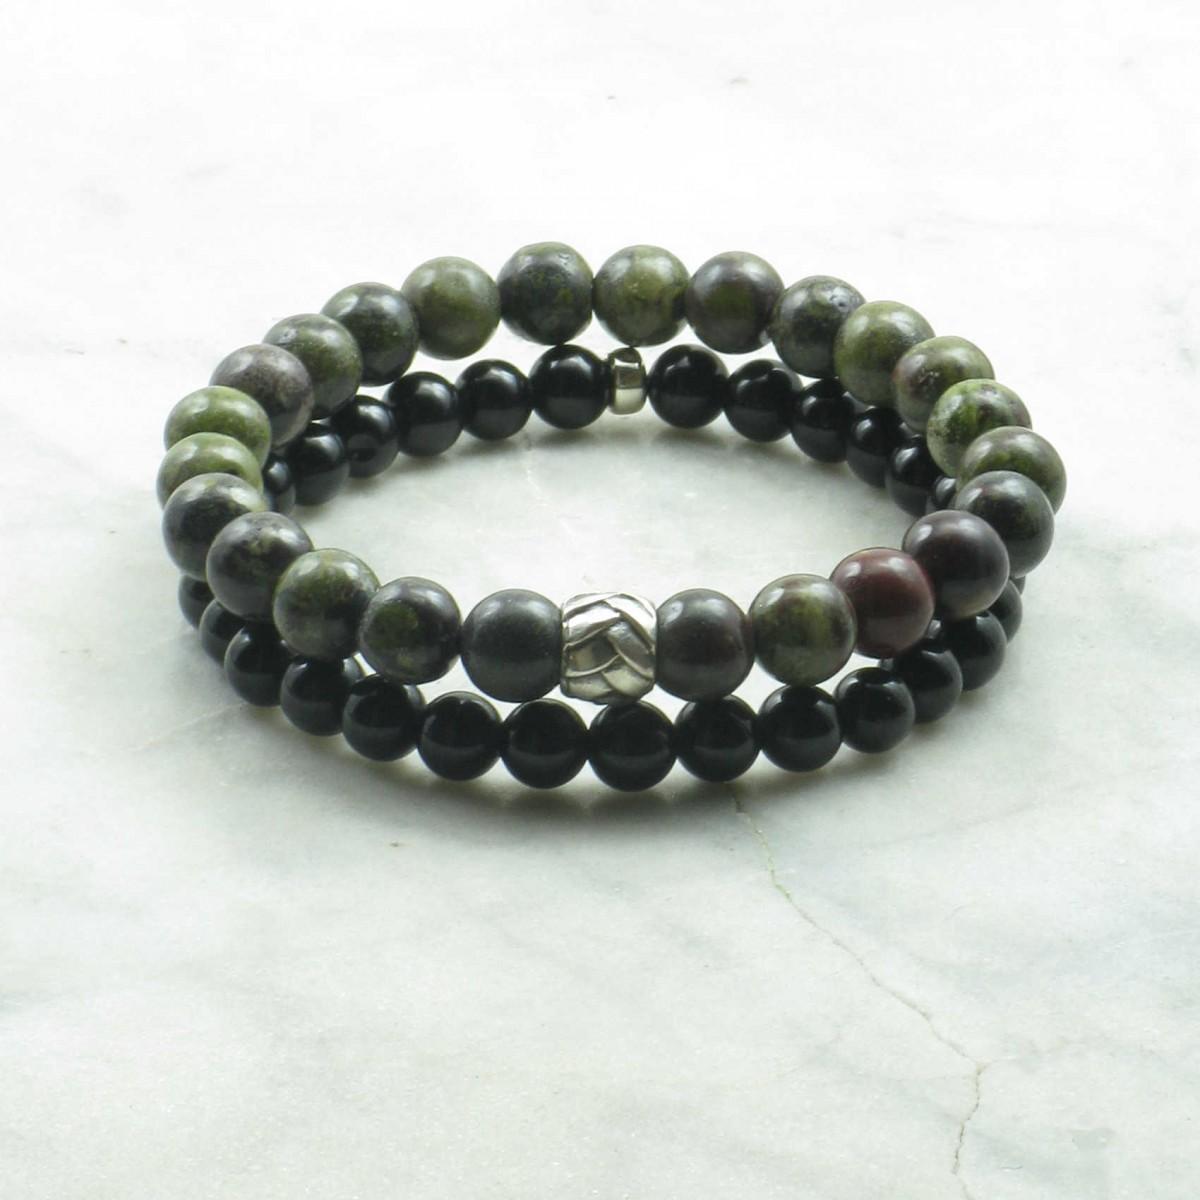 Dragon_Bracelets_for_Men_Mala_Beads_Stacks_Dragon_Blood_Jasper_Onyx_Buddhist_Prayer_Beads